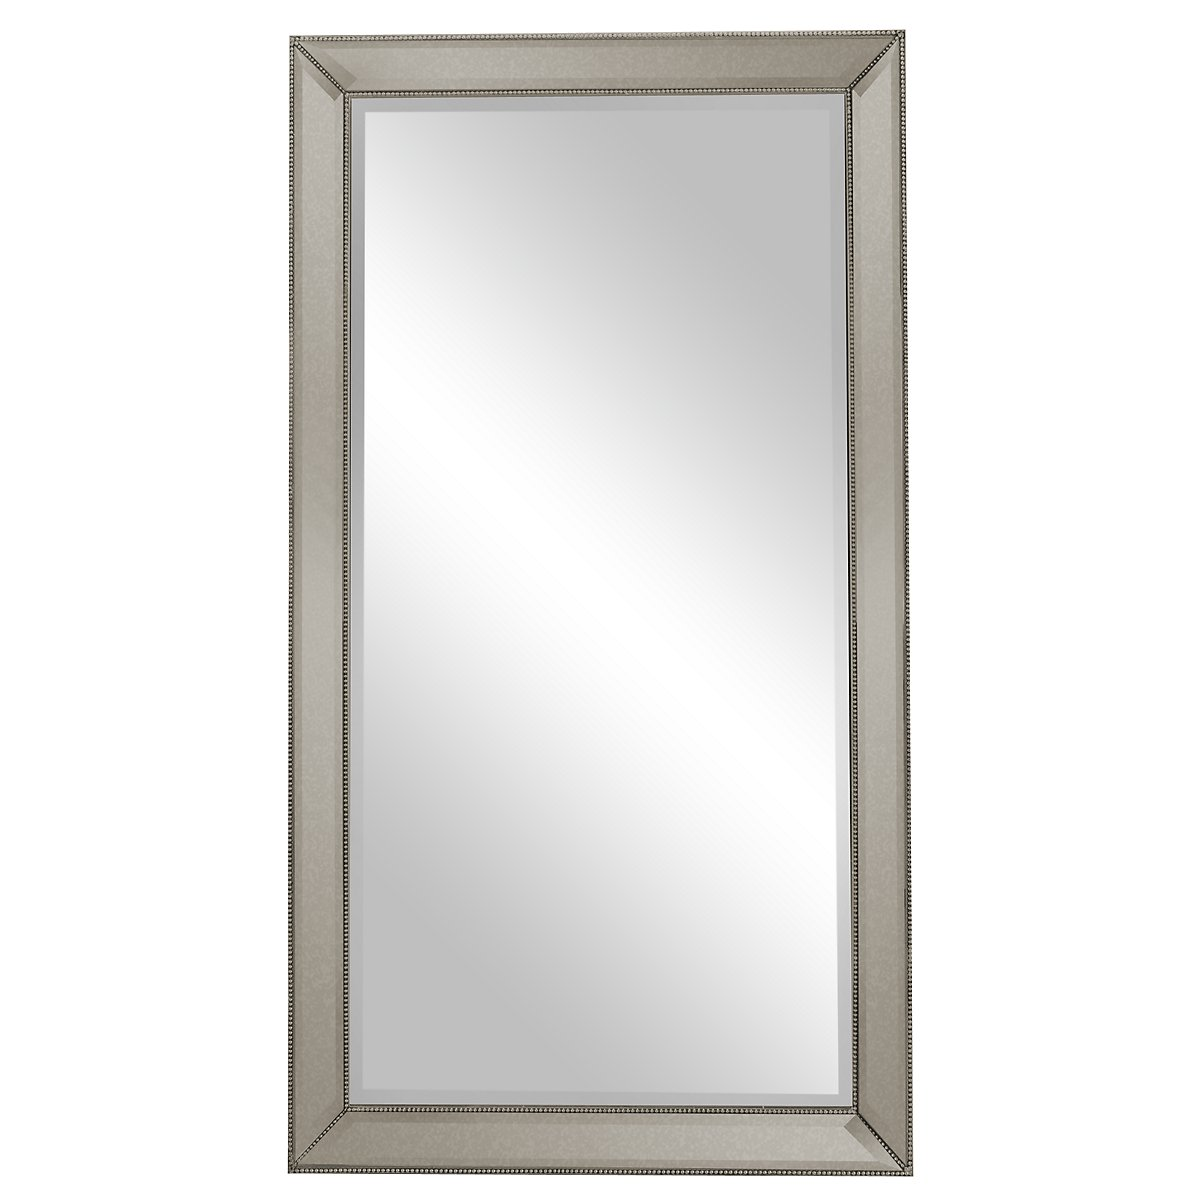 City Furniture: Adiva Silver Leaning Mirror